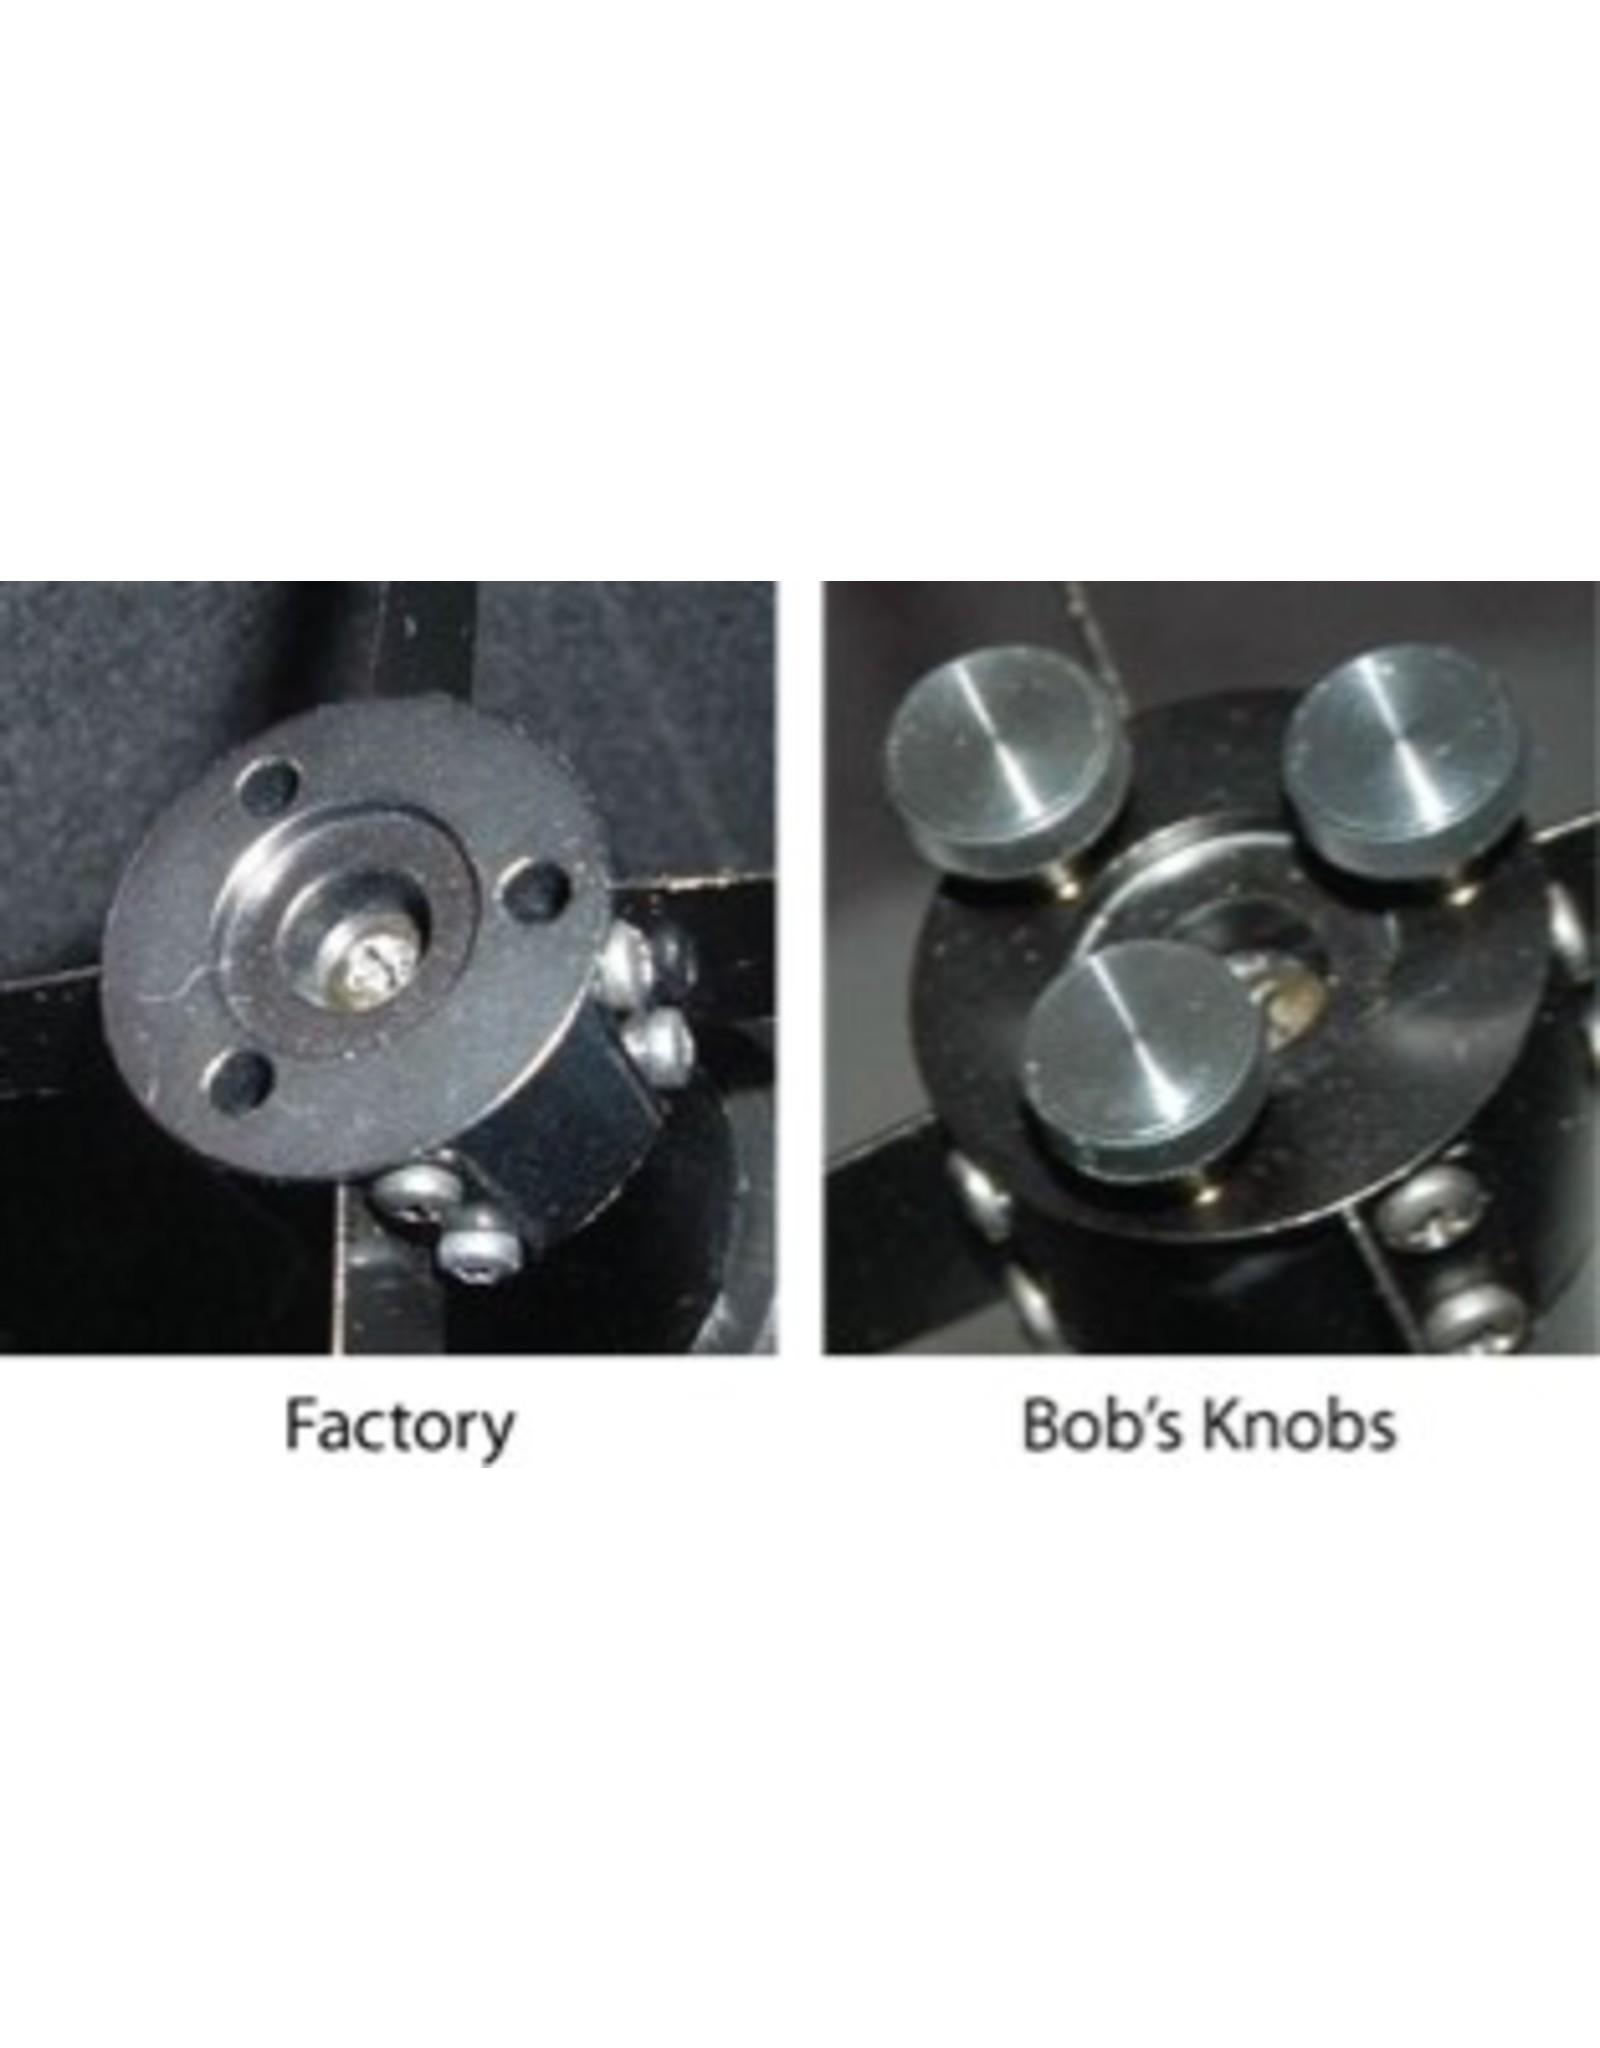 Bob's Knobs Bob's Knobs for Set Screw Secondary Common Newtonian